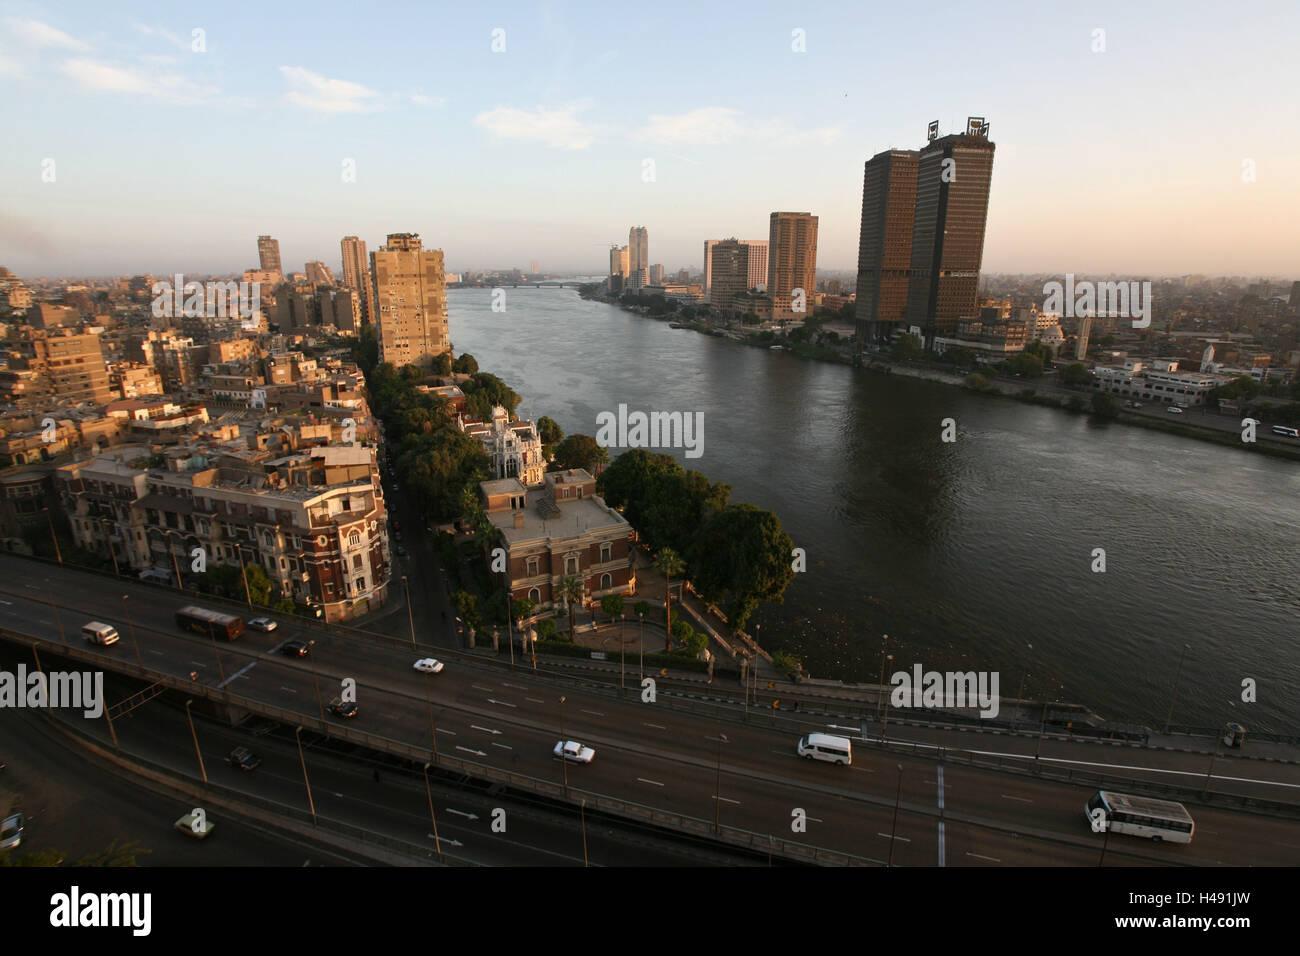 Egypt, Cairo, city centre, the Nile, streets, bridge, evening light, - Stock Image